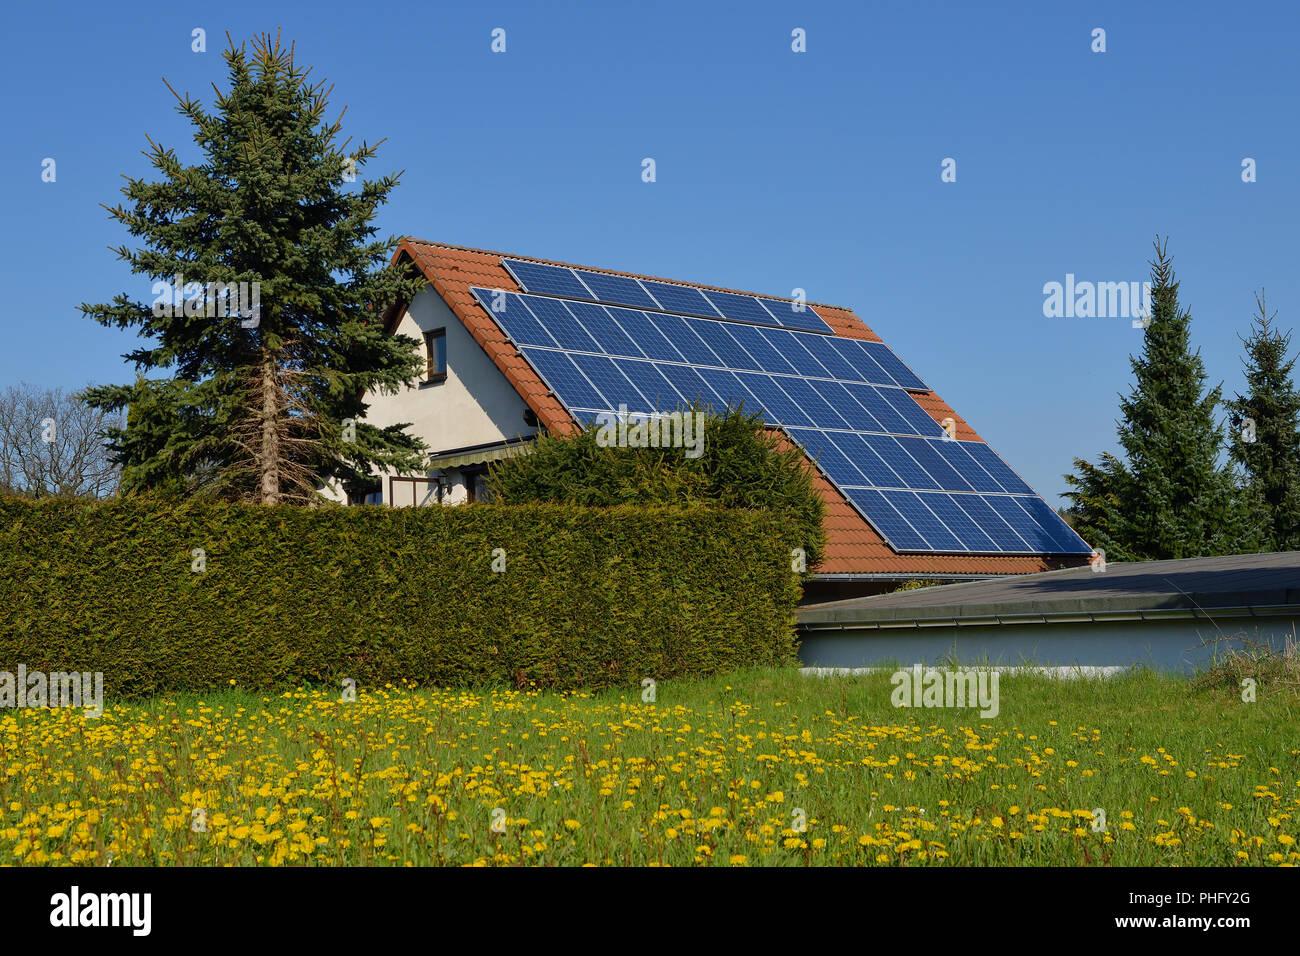 Photovoltaic modules - Stock Image